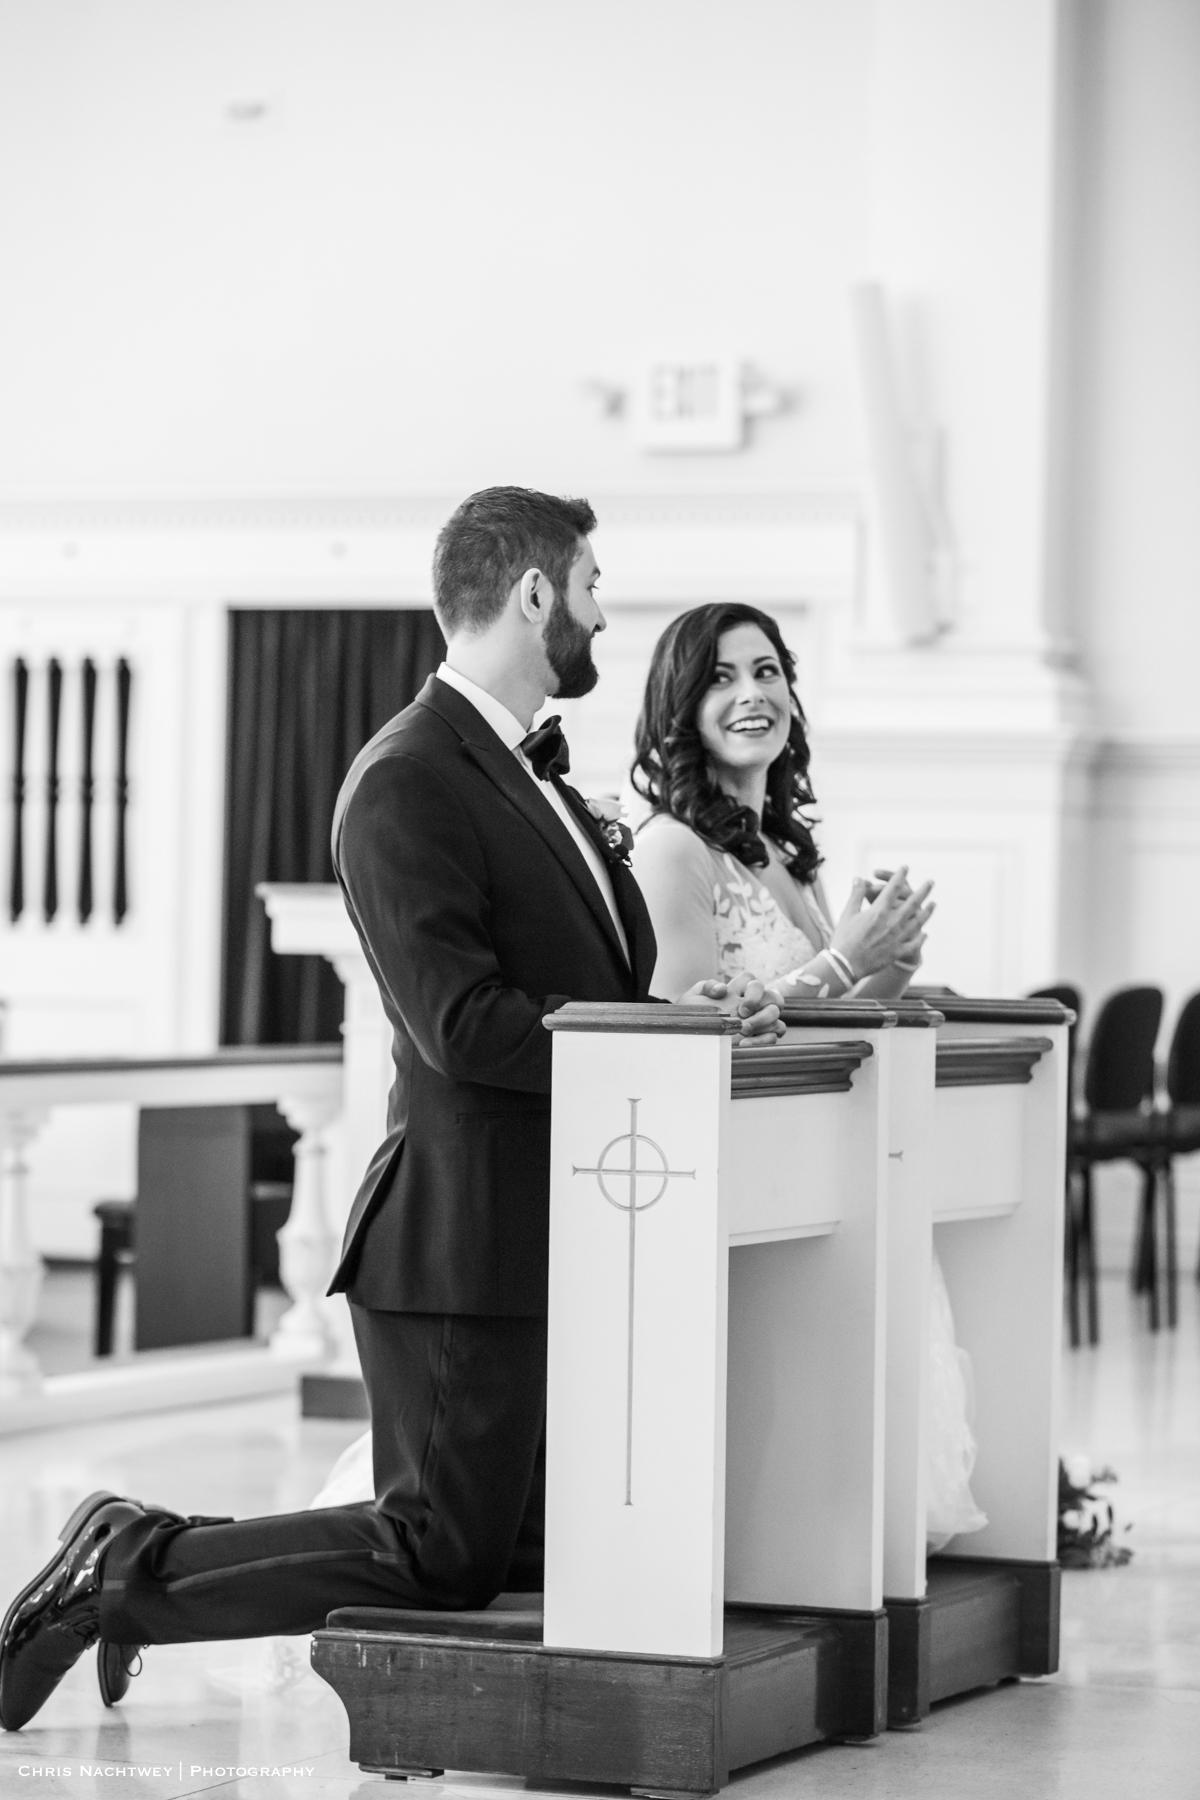 winter-branford-house-wedding-photos-groton-ct-chris-nachtwey-photography-2019-14.jpg